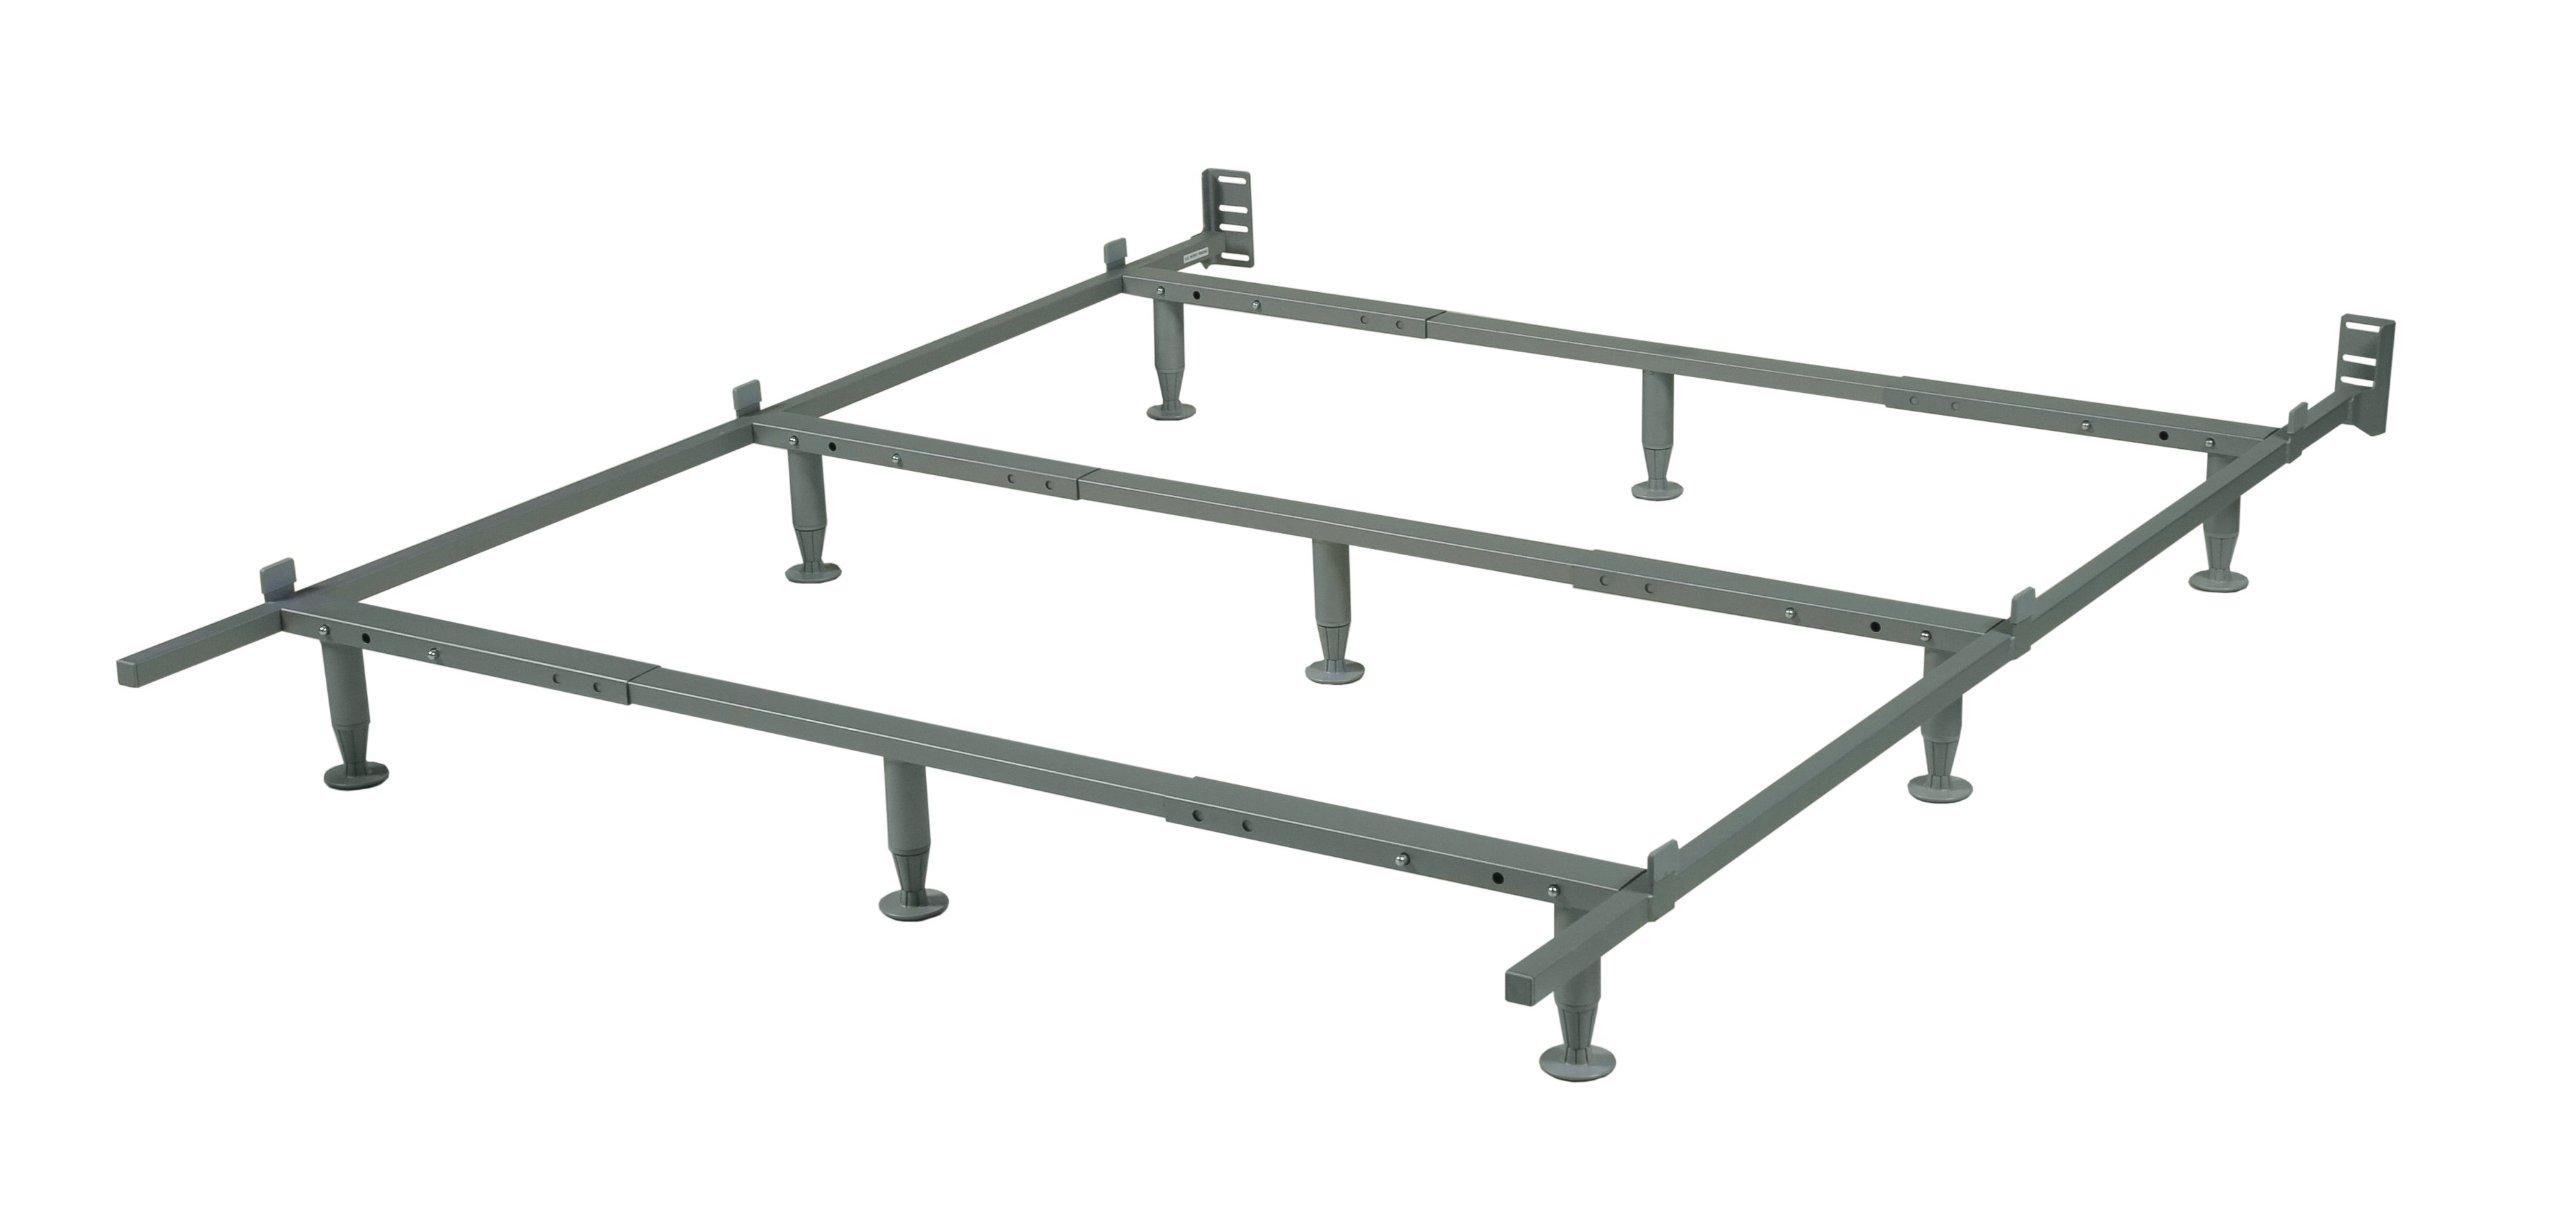 Mantua 9-Leg Ultimate Adjustable Bed Frame